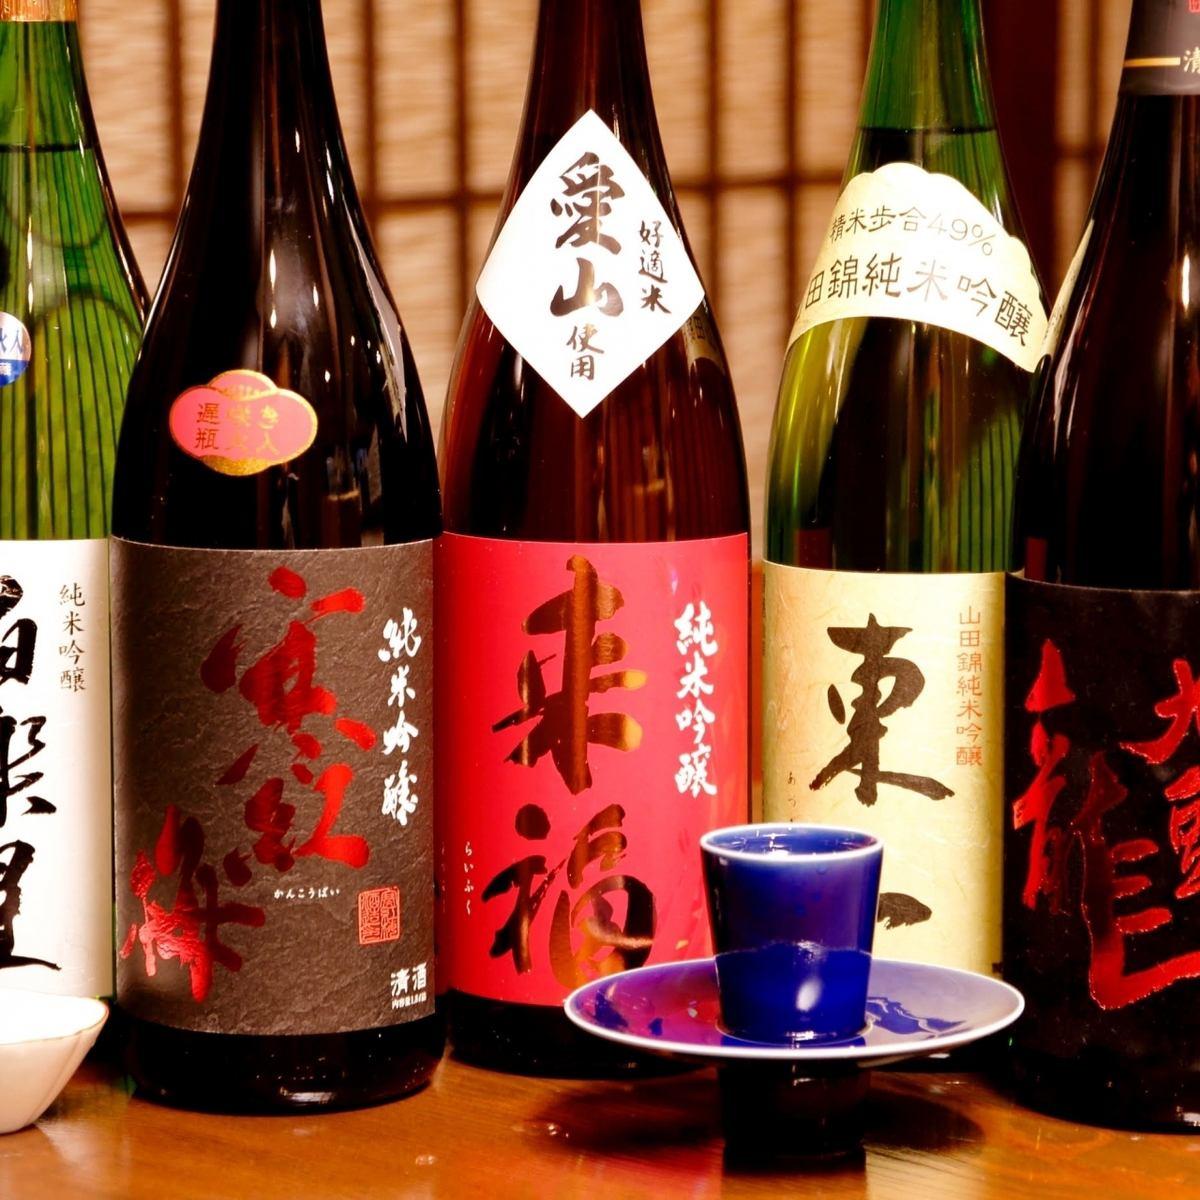 Fresh fish × Fire oven × Sake